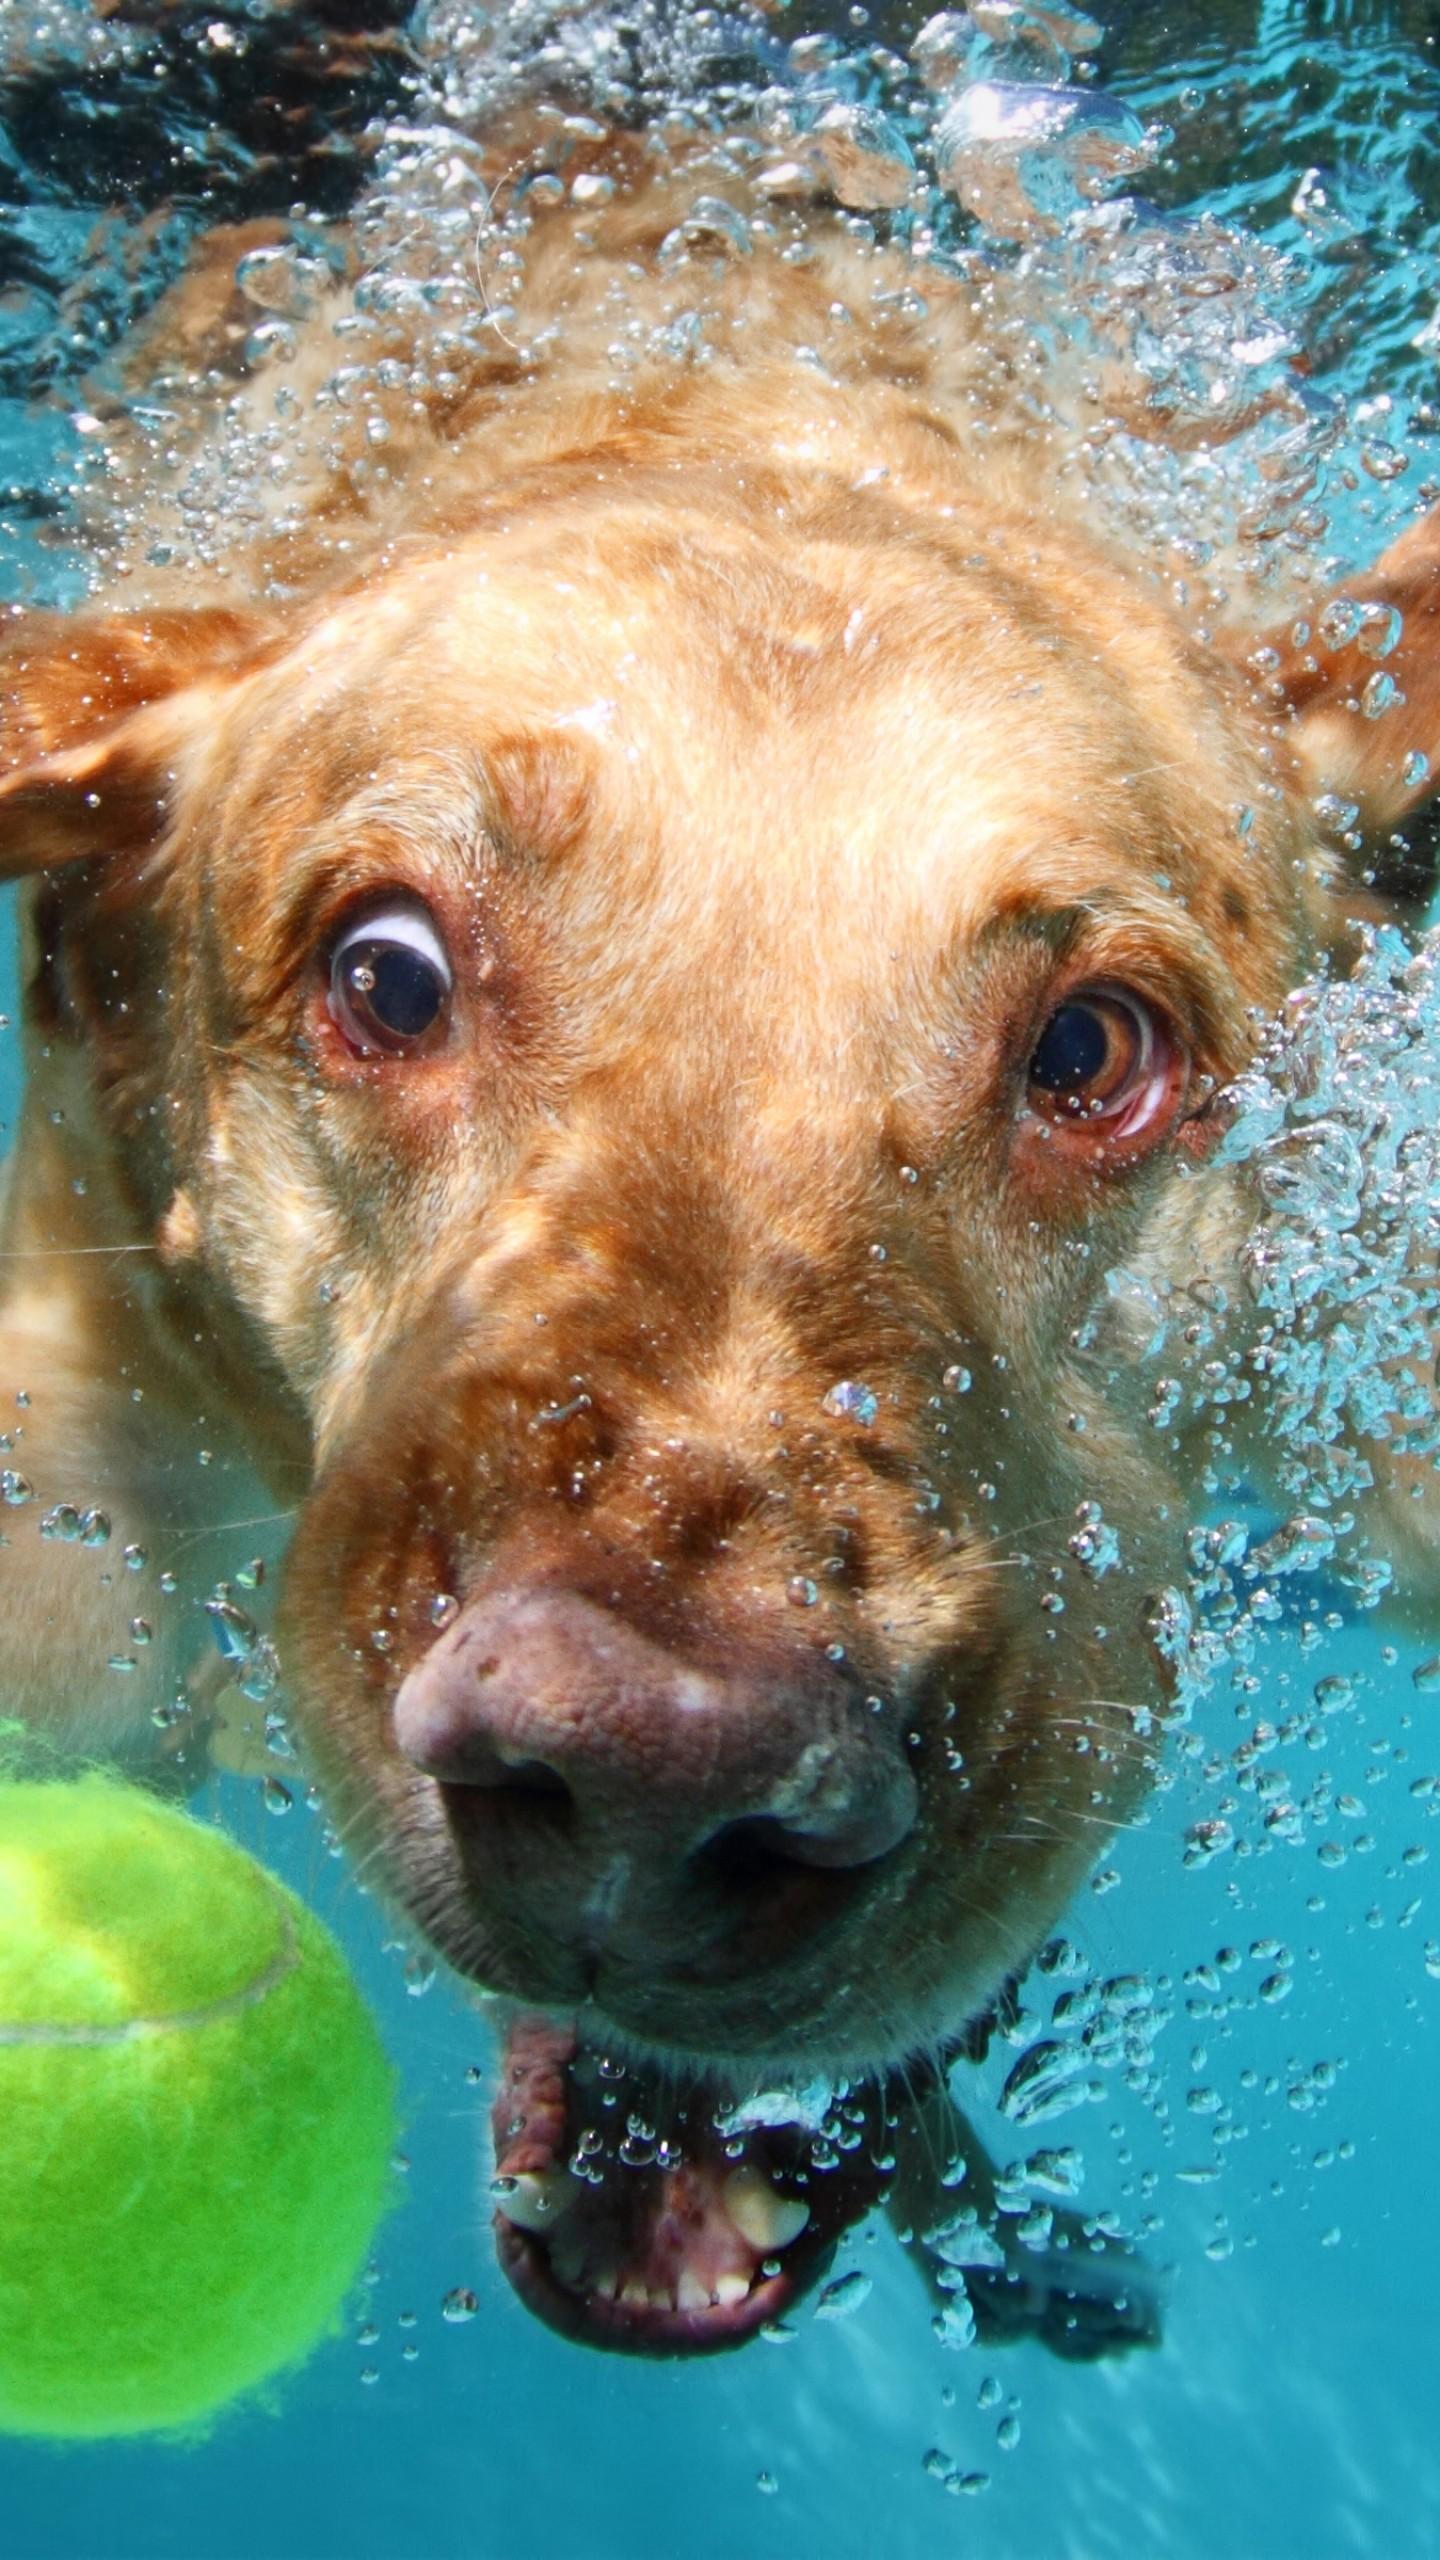 Field Wallpaper Hd Wallpaper Labrador Dog Underwater Cute Animals Funny